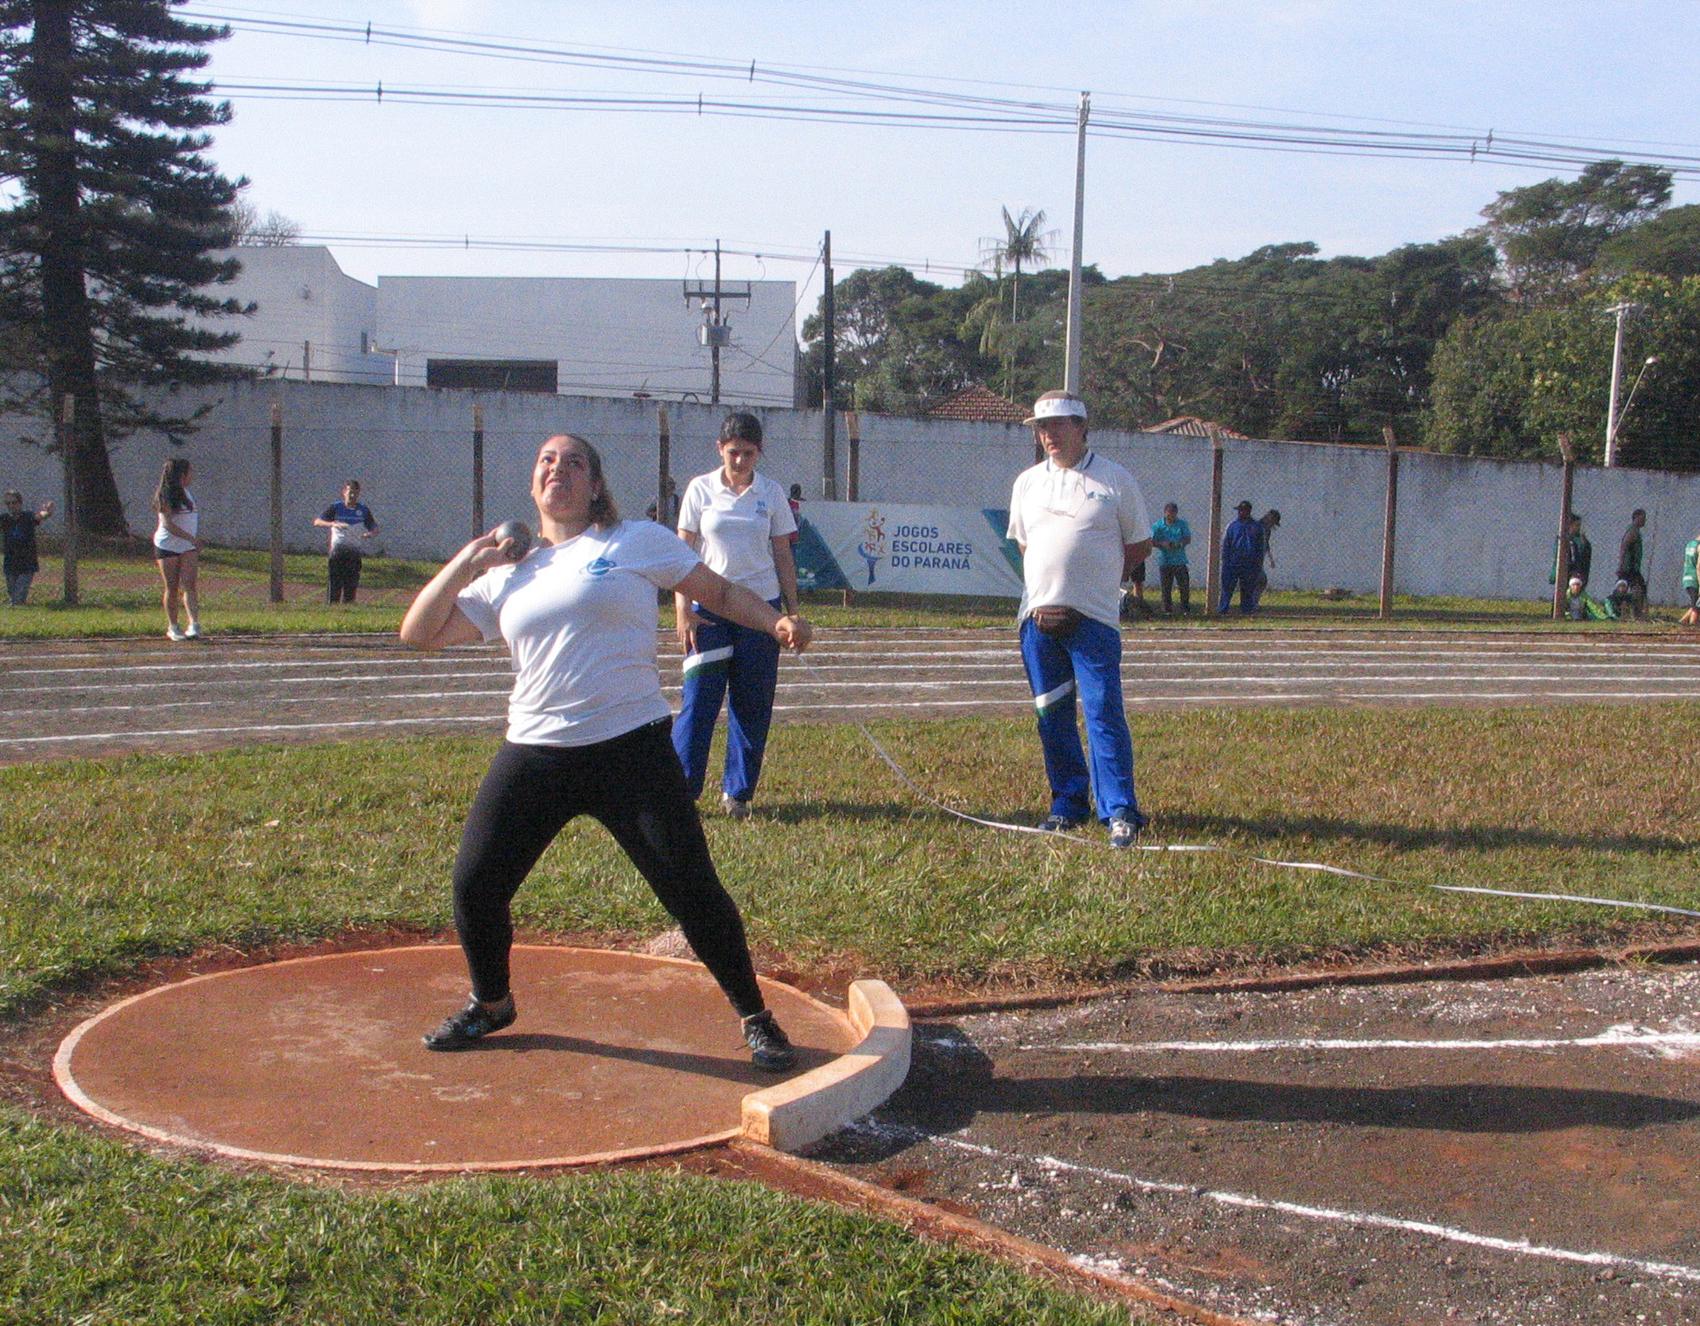 Giovanna Nogueira Vespero - Jogos Escolares 2017 - Foto: Marcelo Flessak/SEET-PR